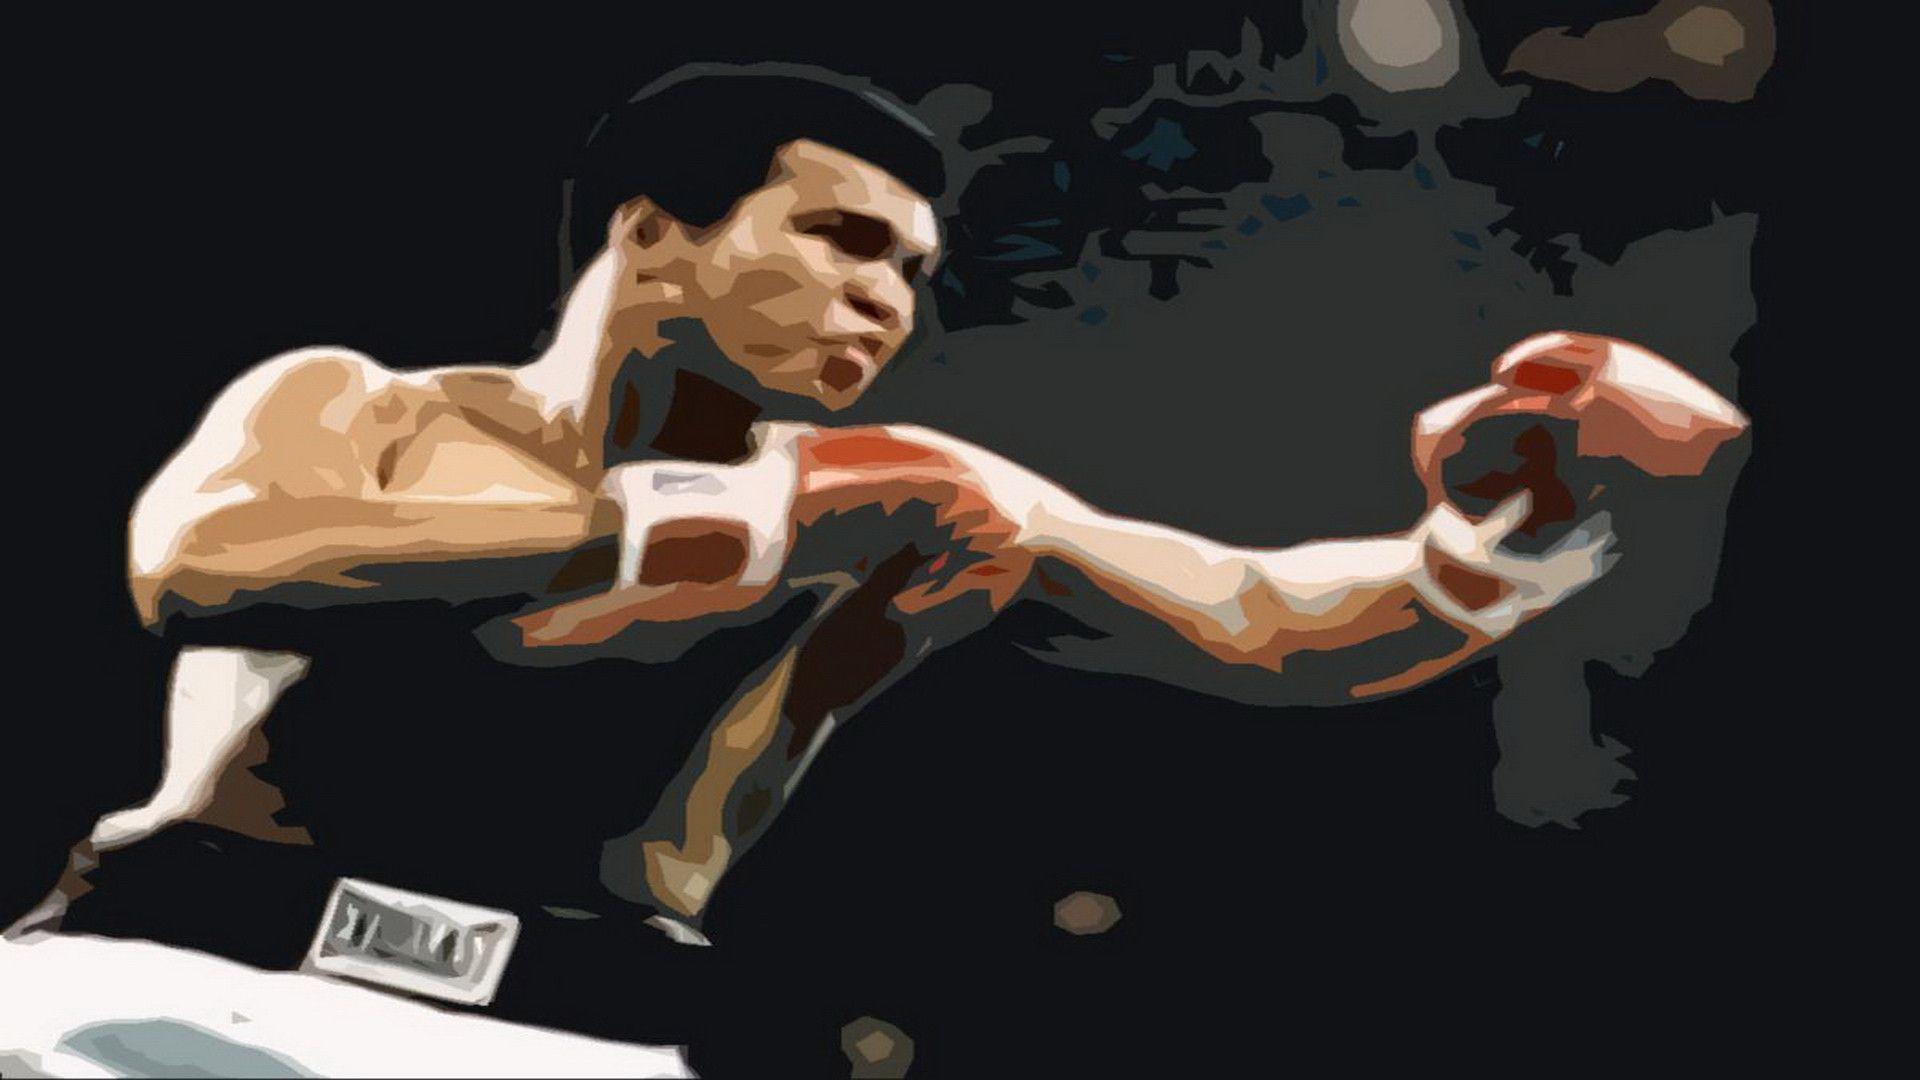 Muhammad Ali Wallpapers 18 HD Desktop Wallpapers 1920x1080